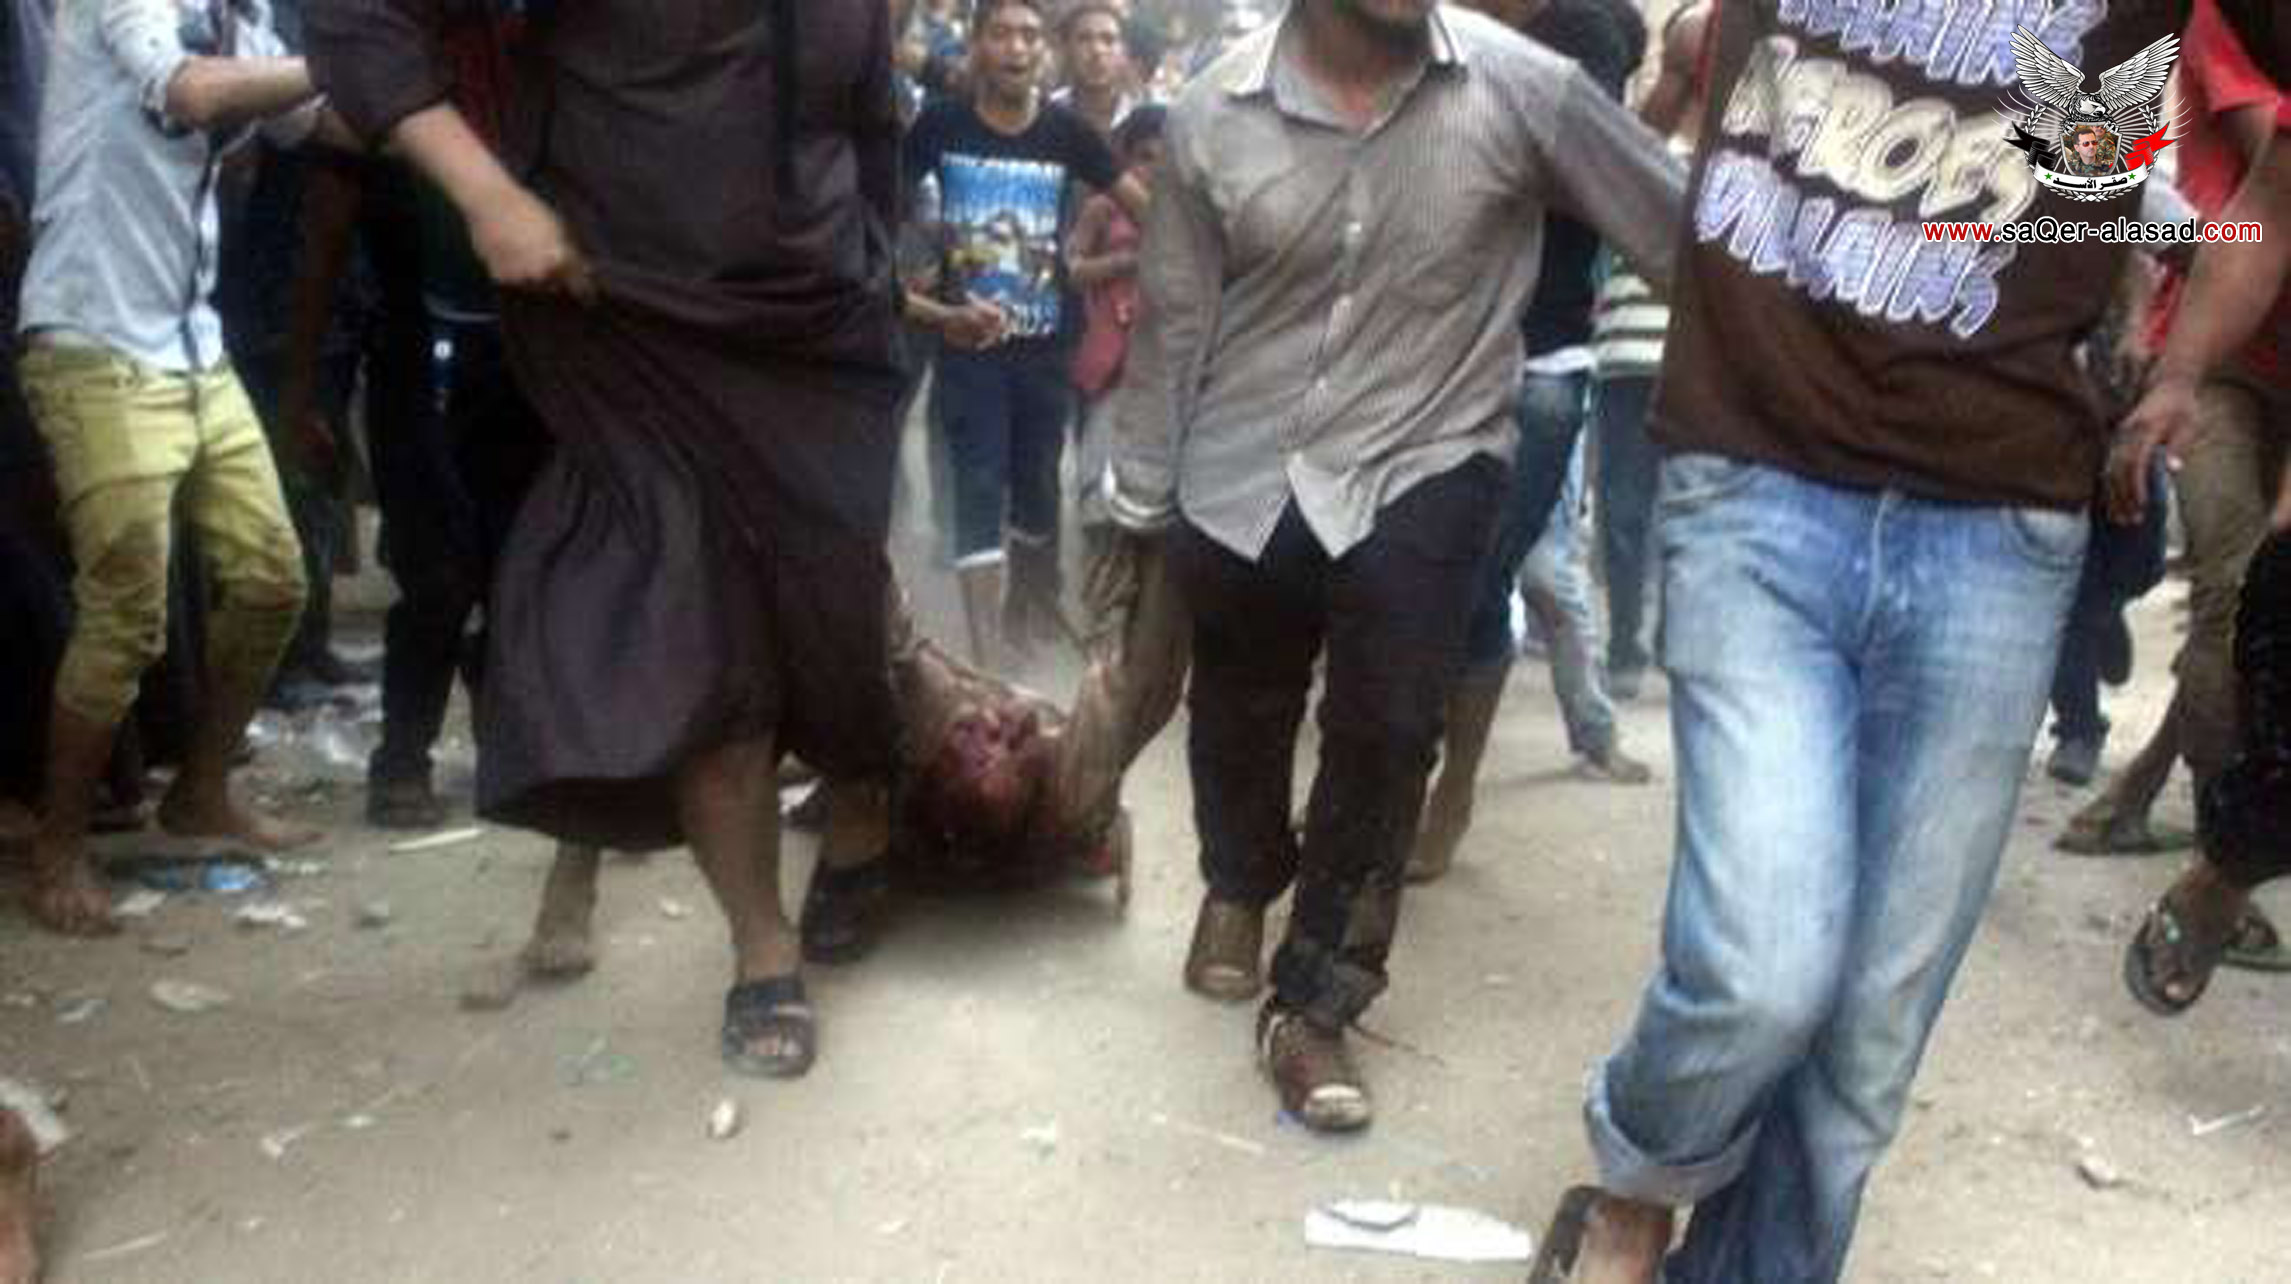 23 Sentenced to Prison for Massacre of Egyptian Shiites